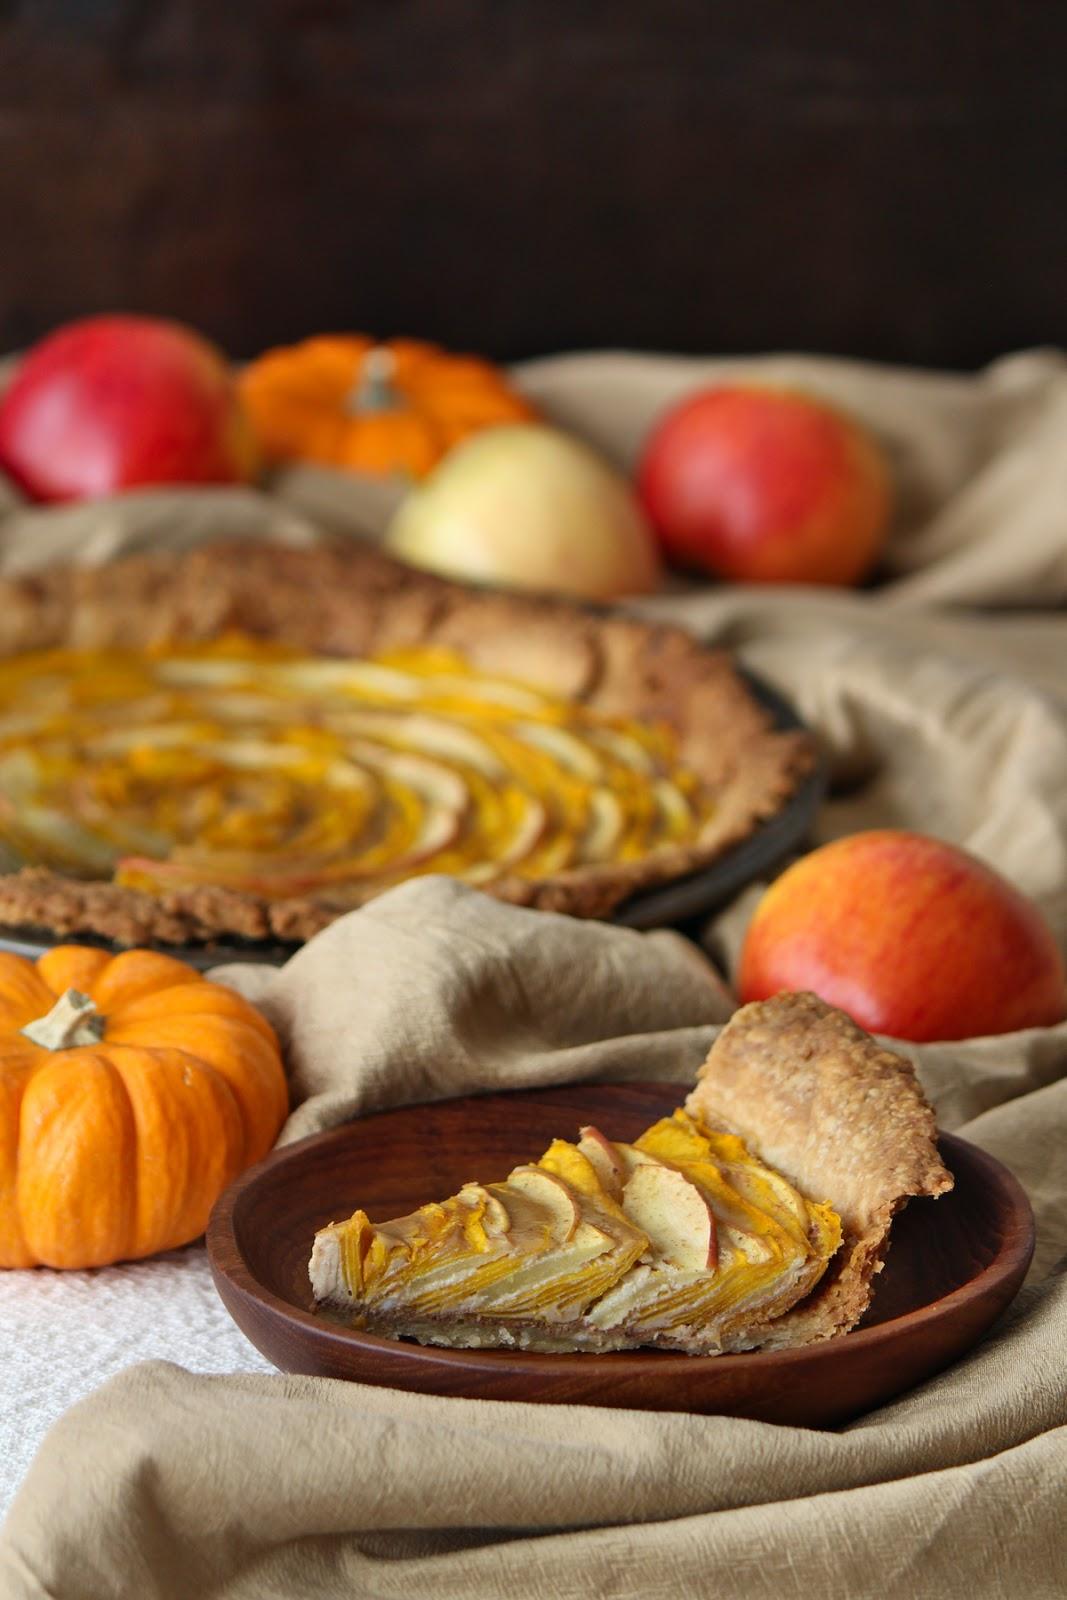 Pumpkin and Apple rose tart - a beautiful dish for a Fall potluck